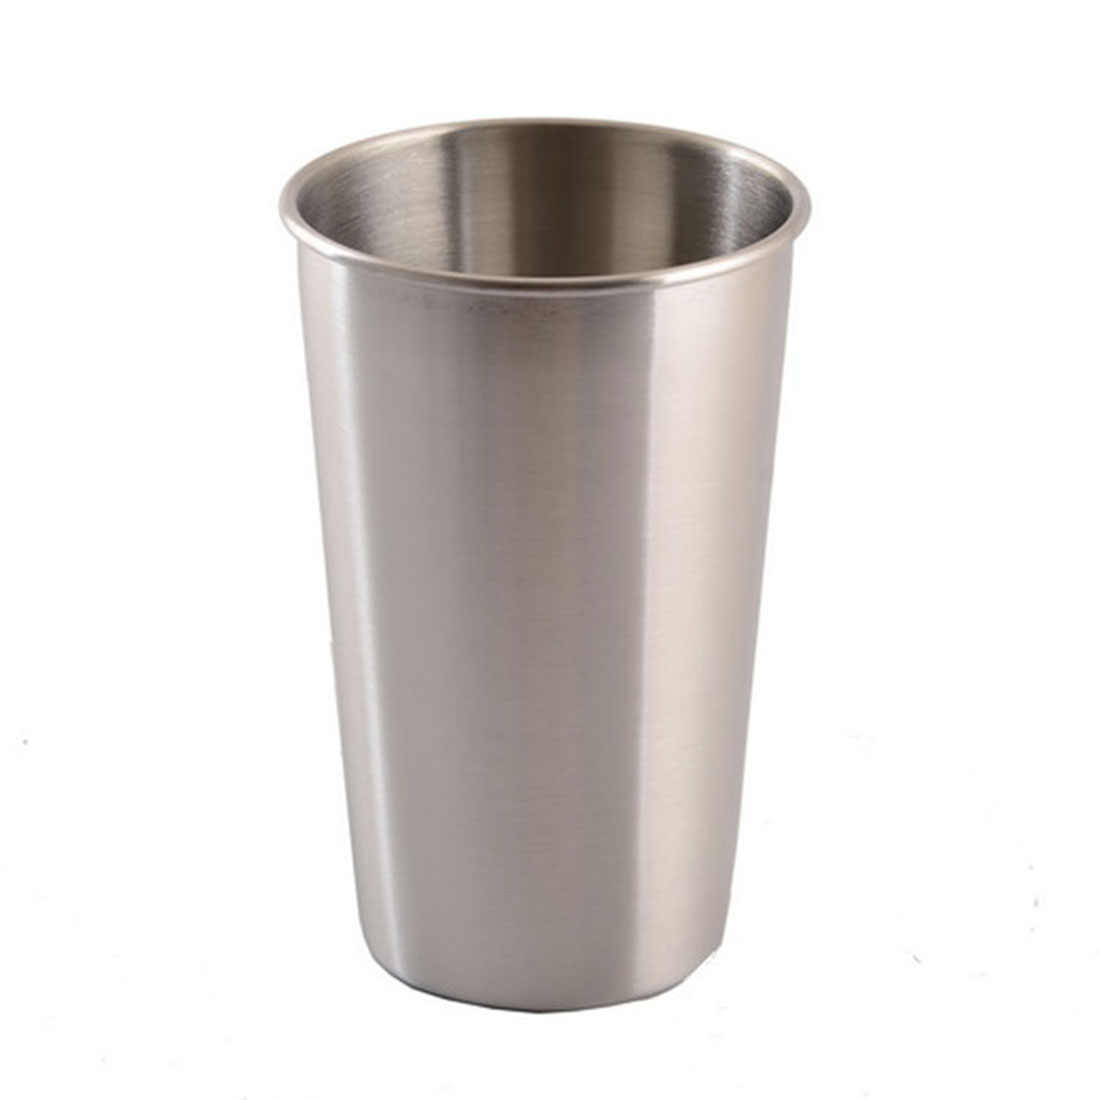 Multi Size Stainless Steel Portable Mug Cup Single Double Wall Travel Tumbler Coffee Wine Beer Mug Tea Water Cup